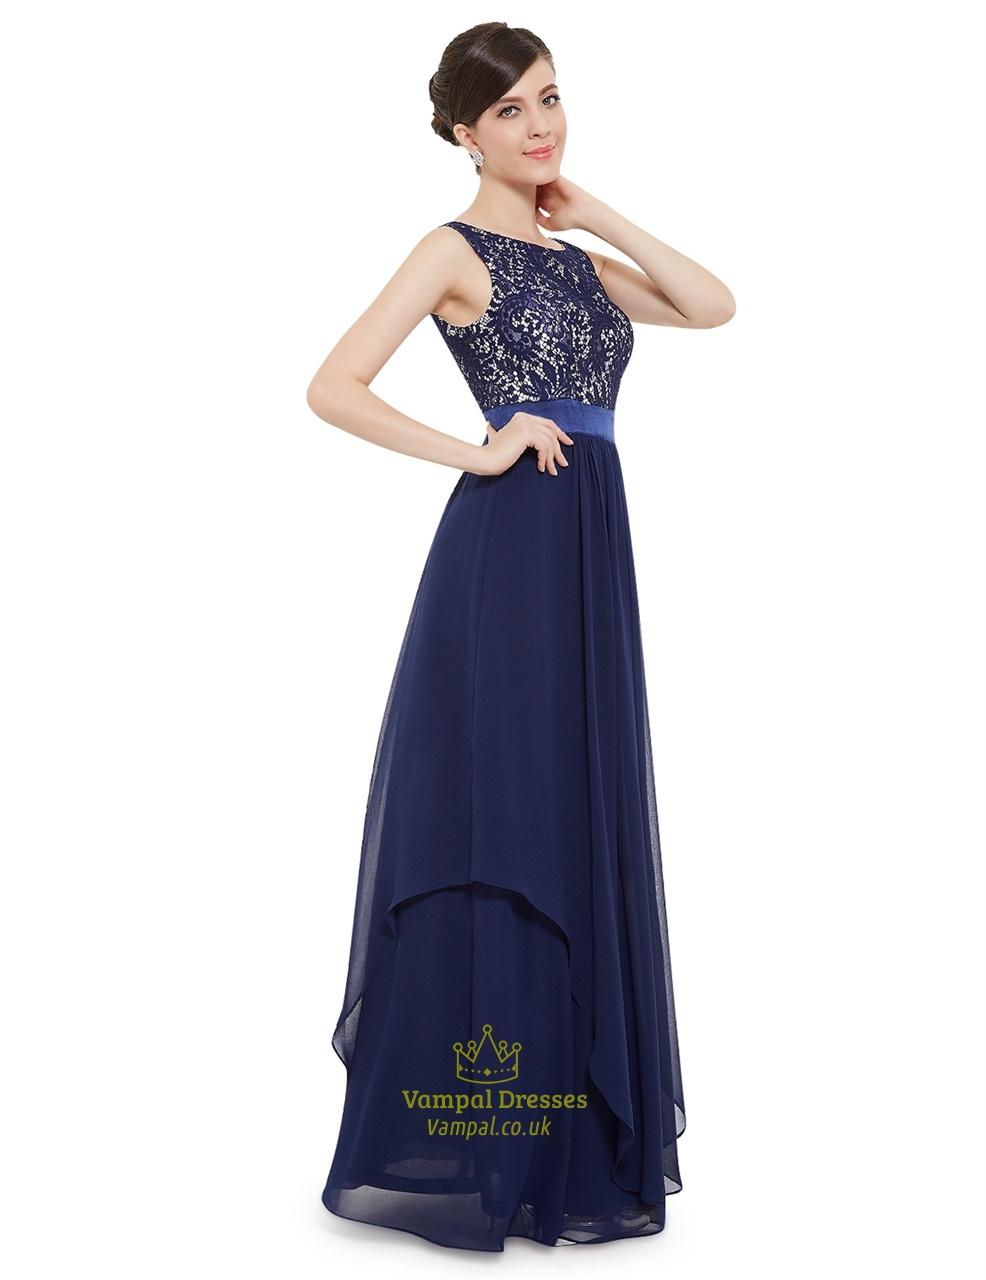 Elegant navy blue chiffon long bridesmaid dresses with lace bodice elegant navy blue chiffon long bridesmaid dresses with lace bodice ombrellifo Images